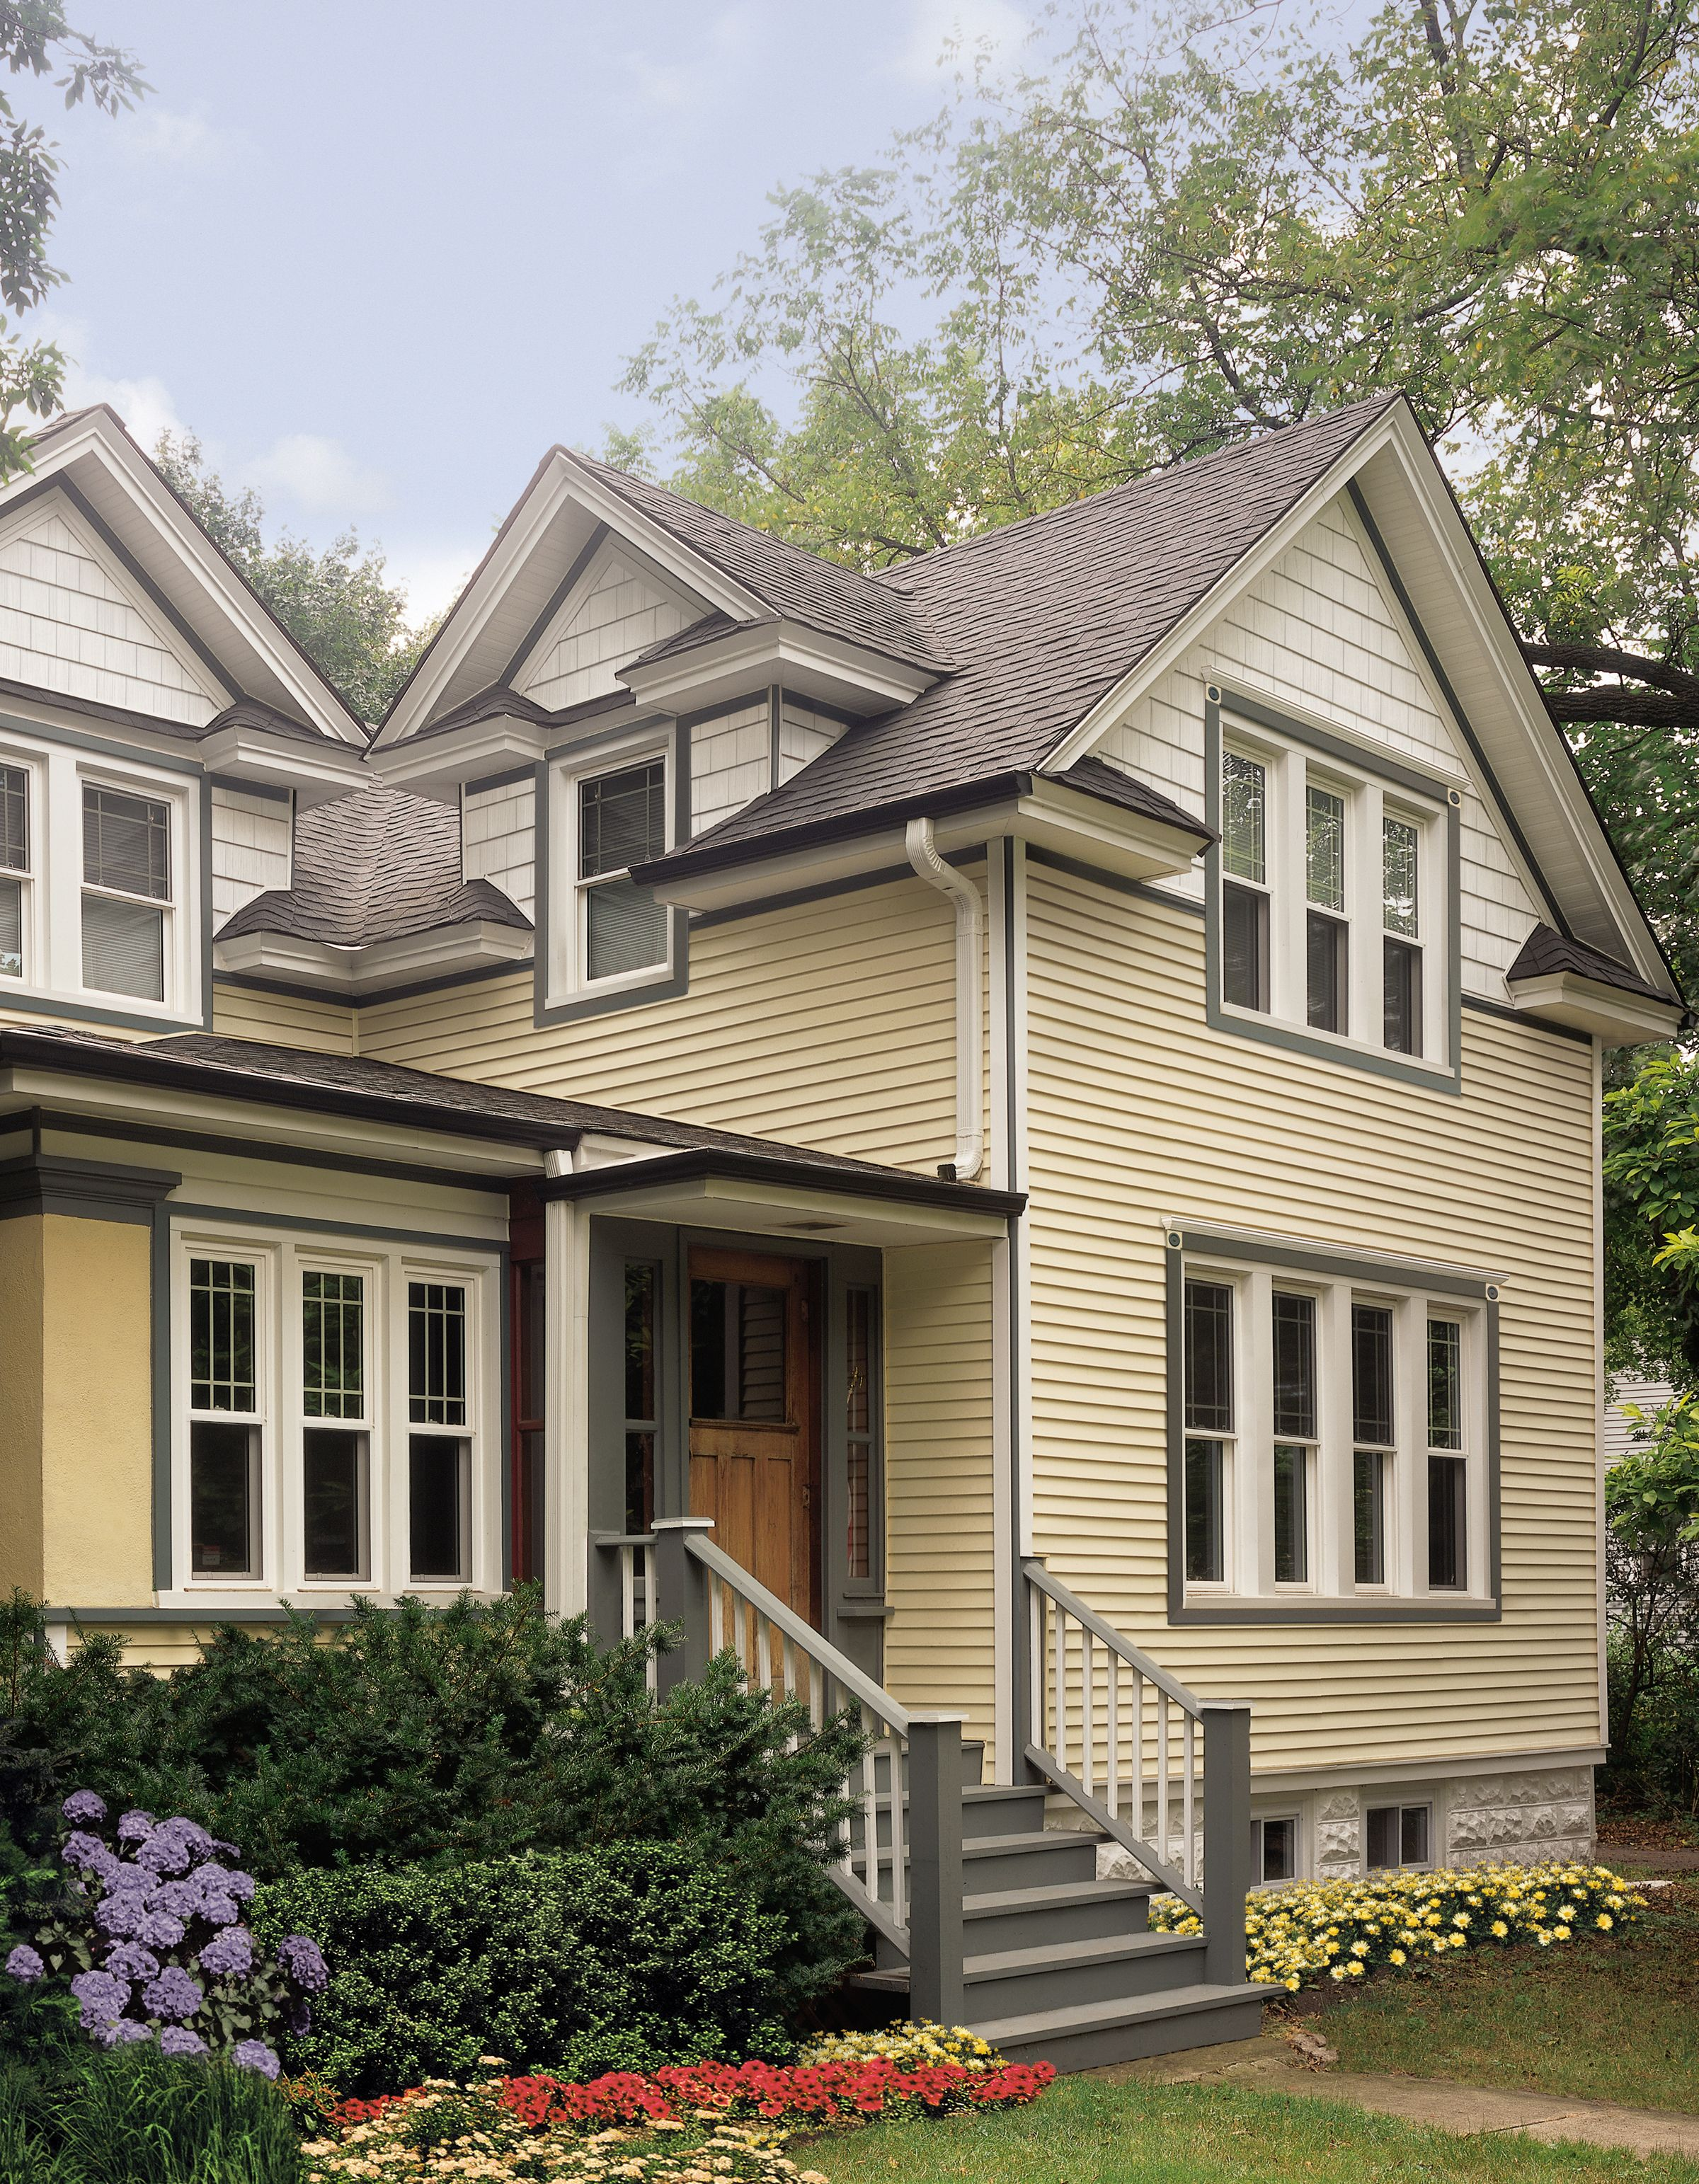 Certainteed Siding Monogram Light Maple Colonial White Yellow House Exterior House Paint Exterior Siding Styles